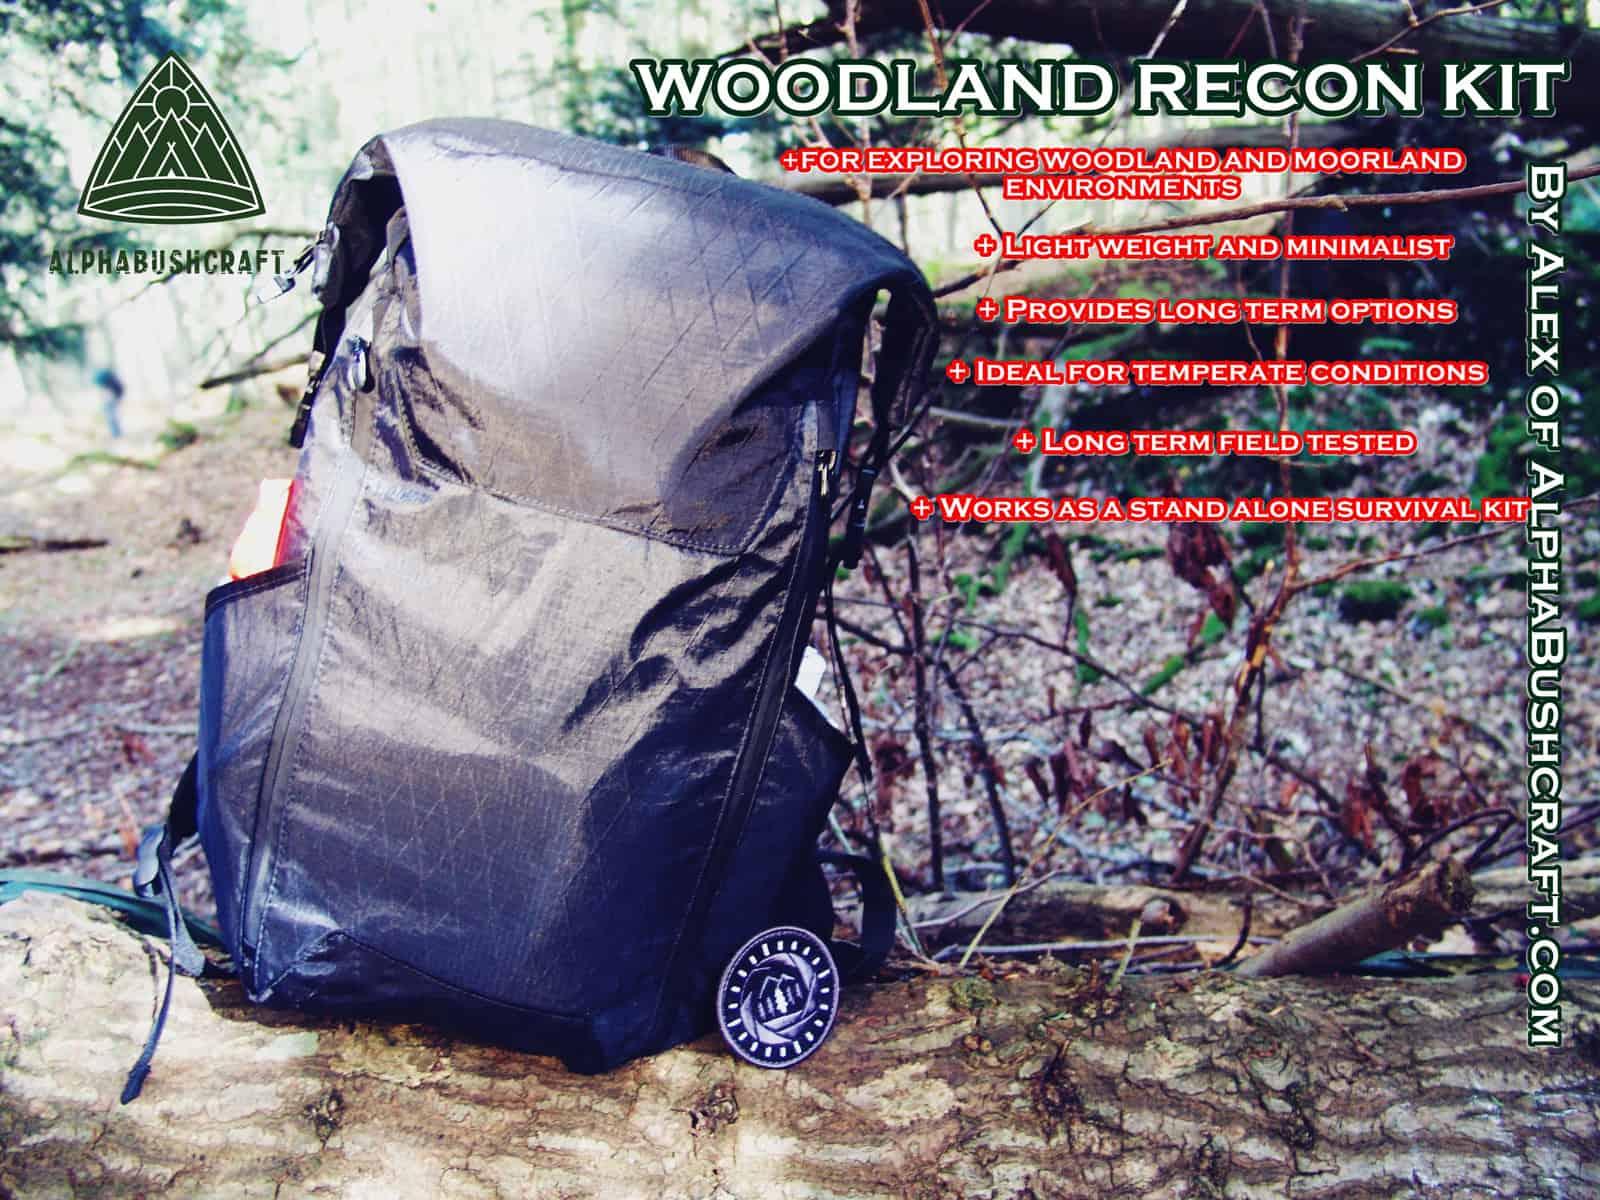 Minimalist Woodland Recon Kit pccover